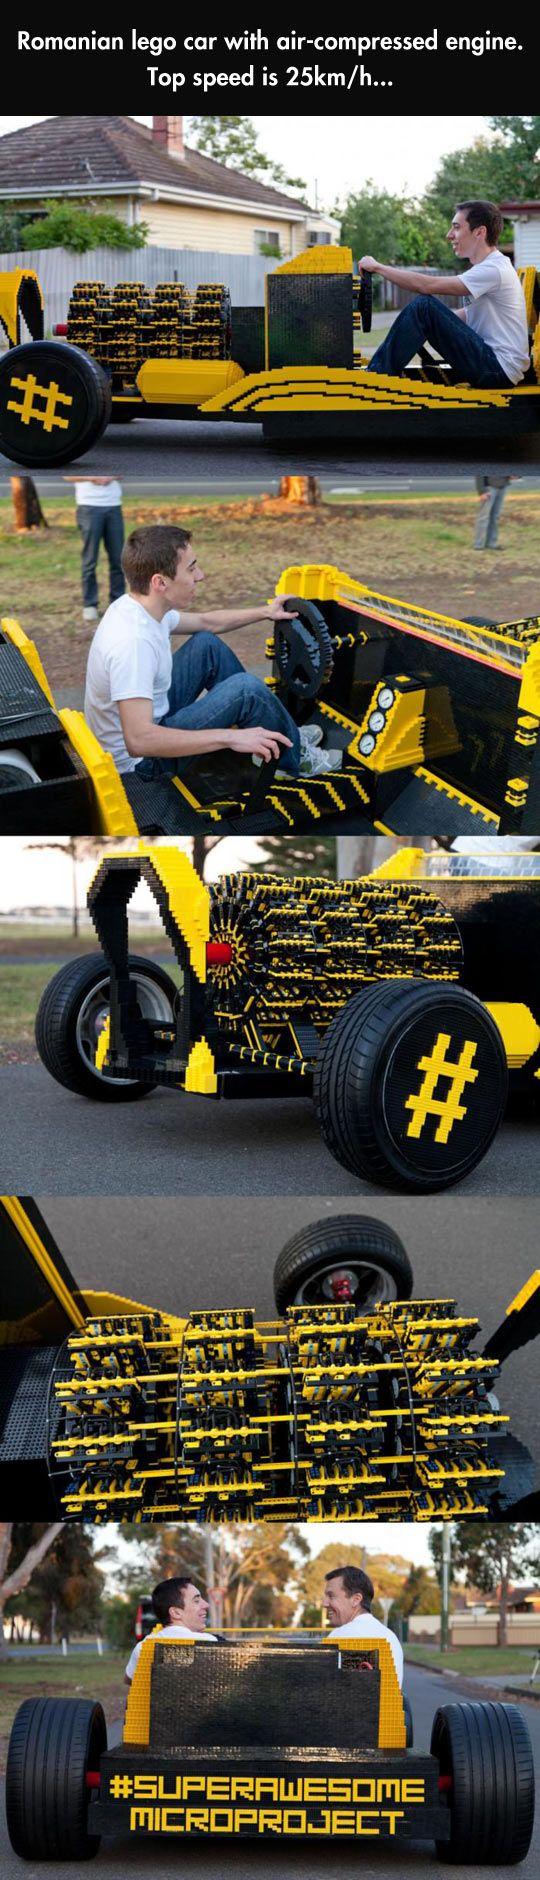 Romanian LEGO Car